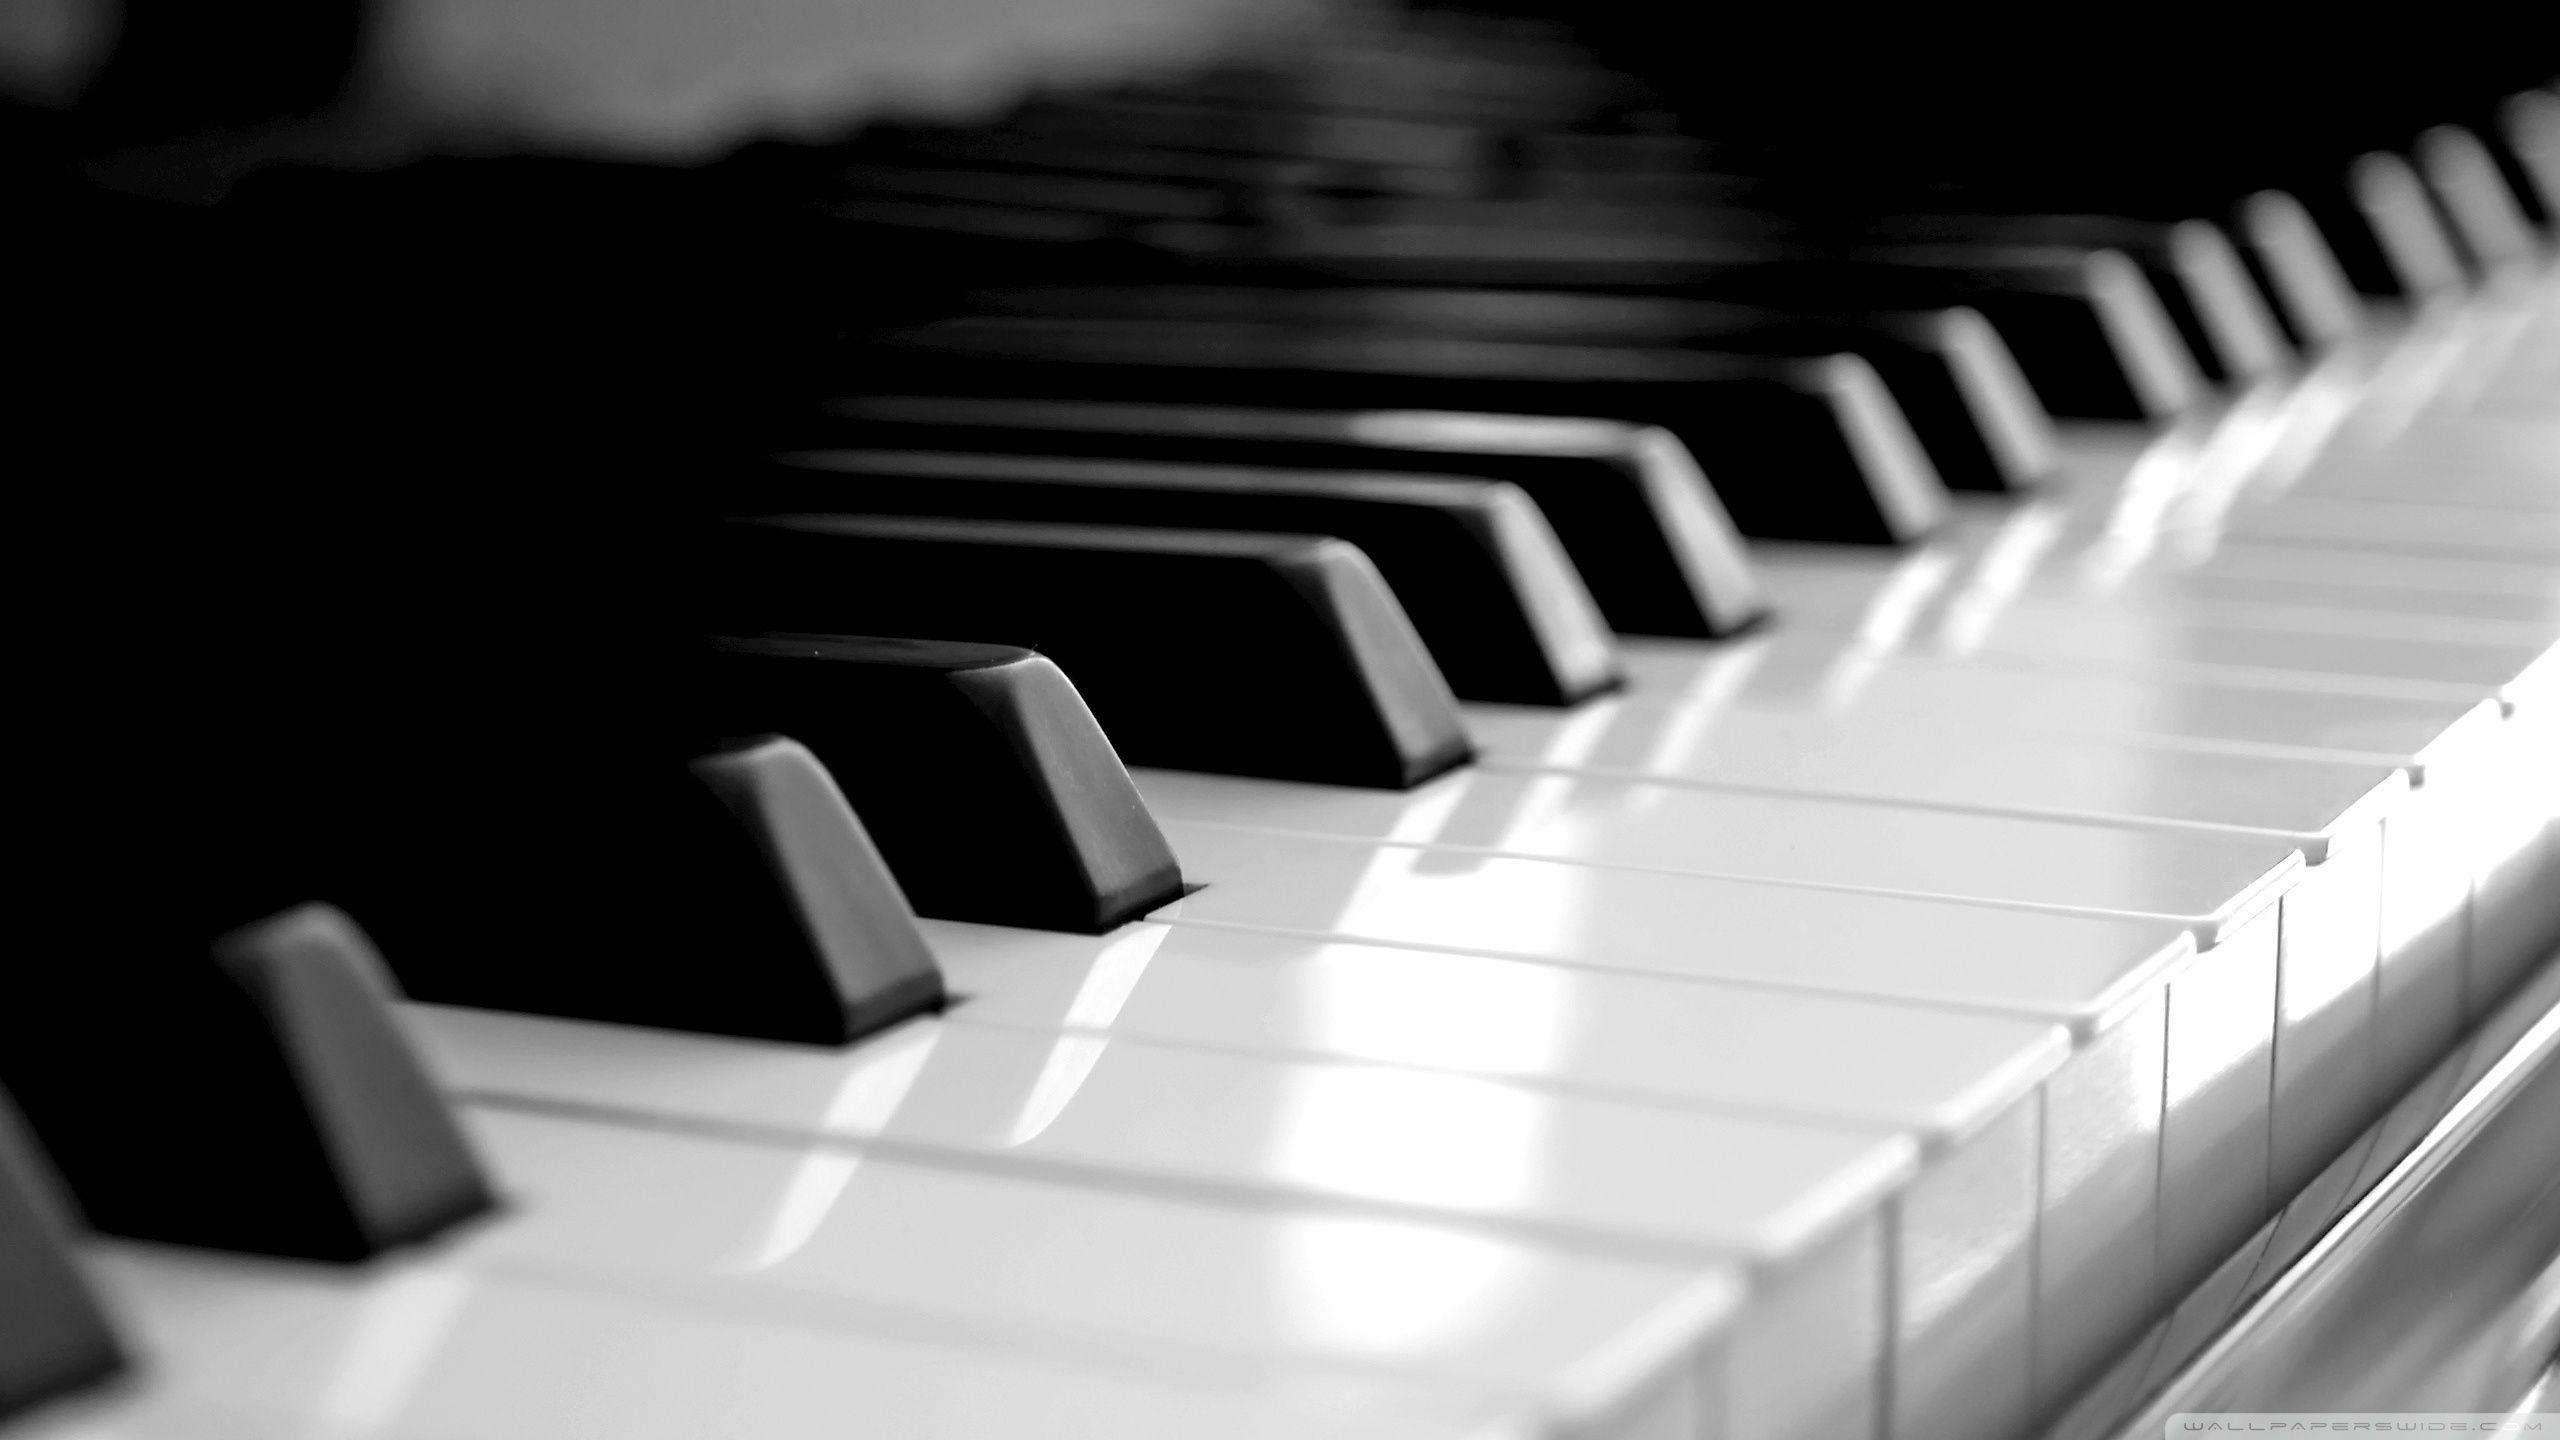 Pin On Music Flyer Hd wallpaper piano keys macro musical